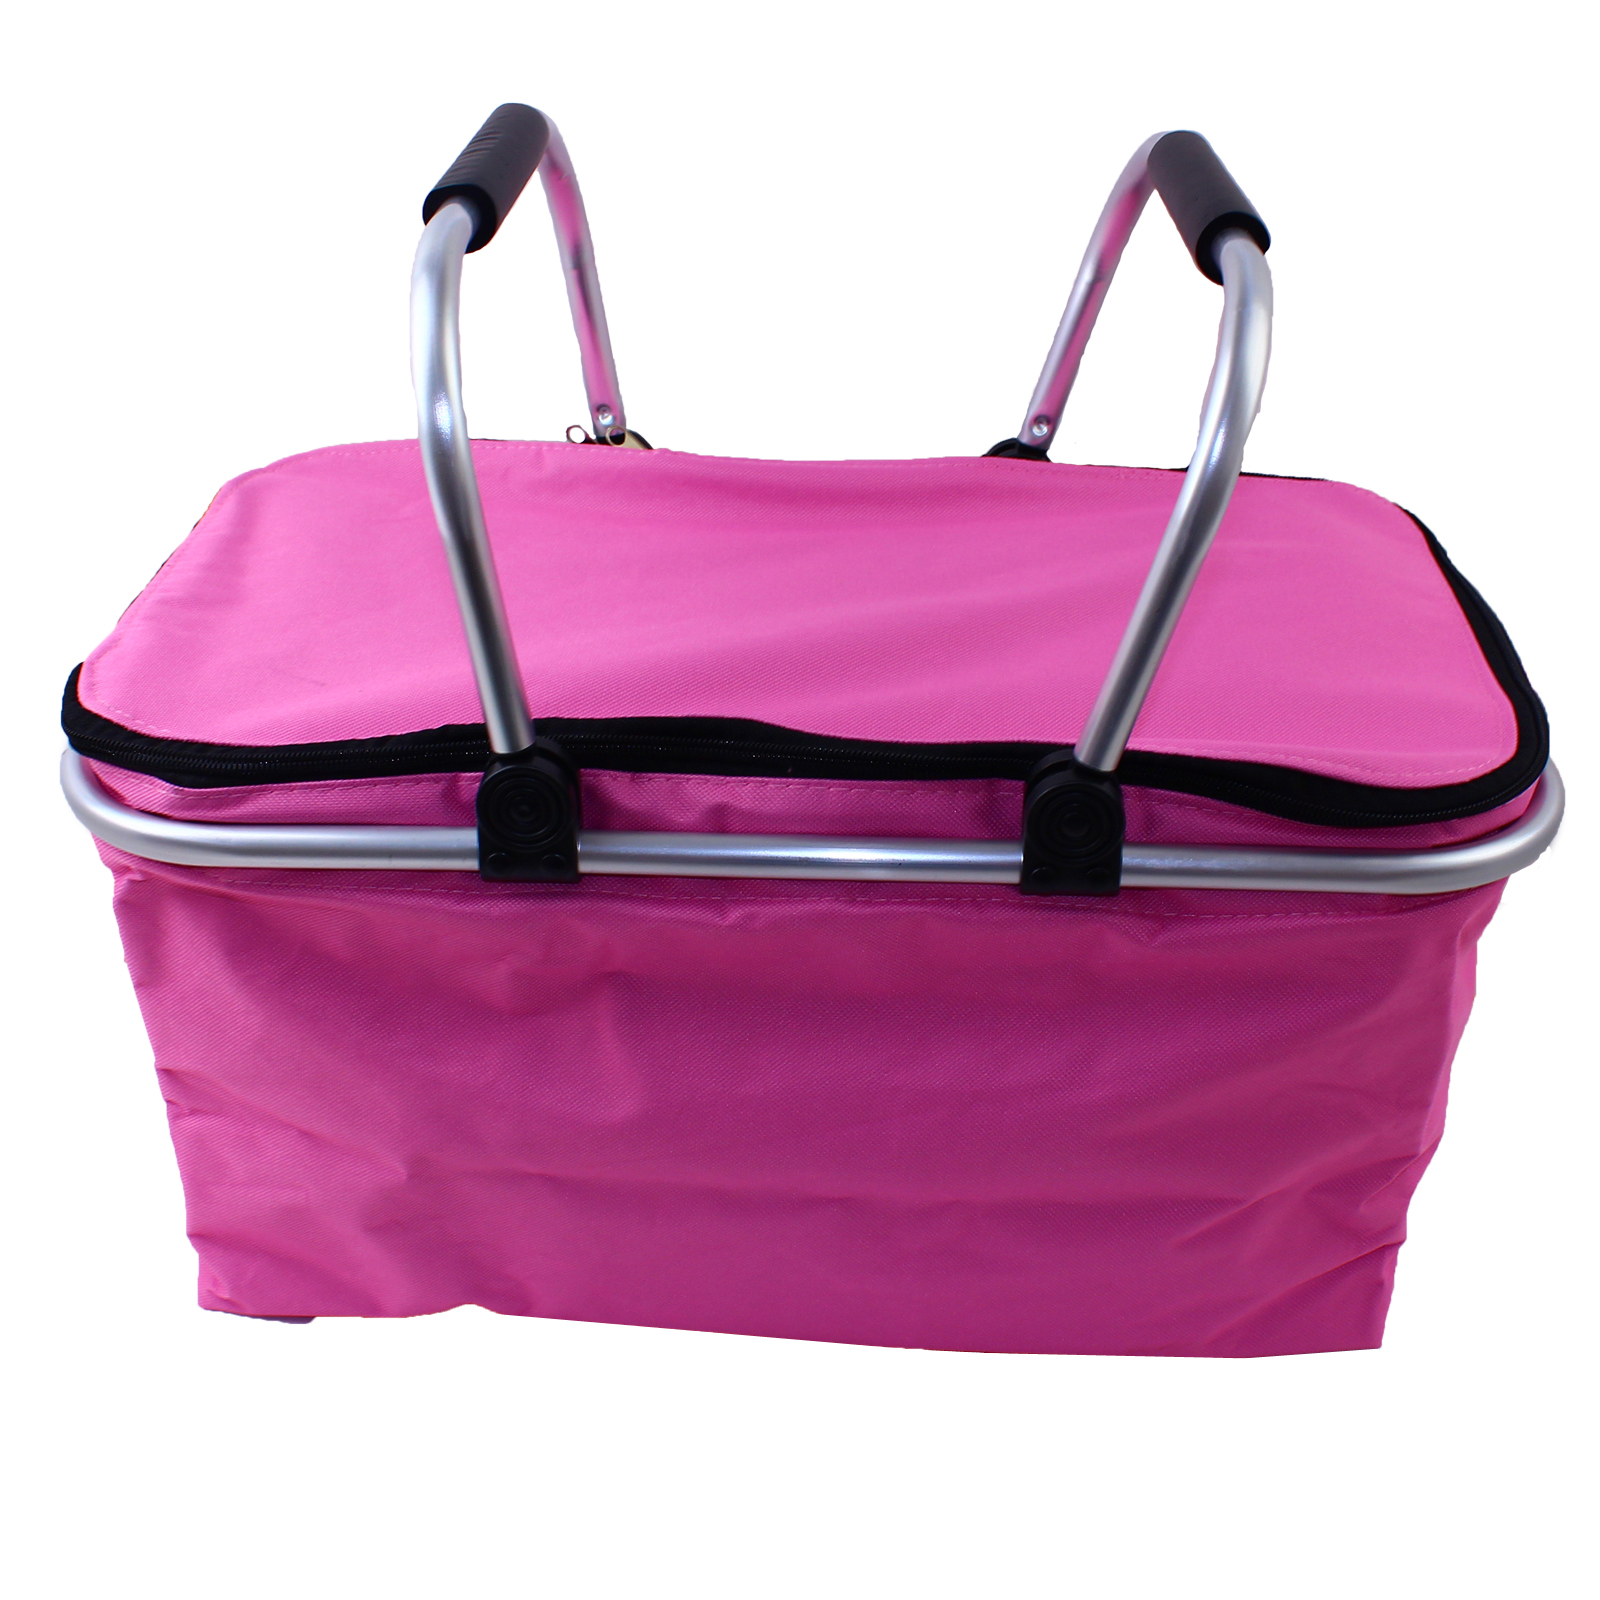 picnic basket refroidisseur sac panier isotherme pliable. Black Bedroom Furniture Sets. Home Design Ideas